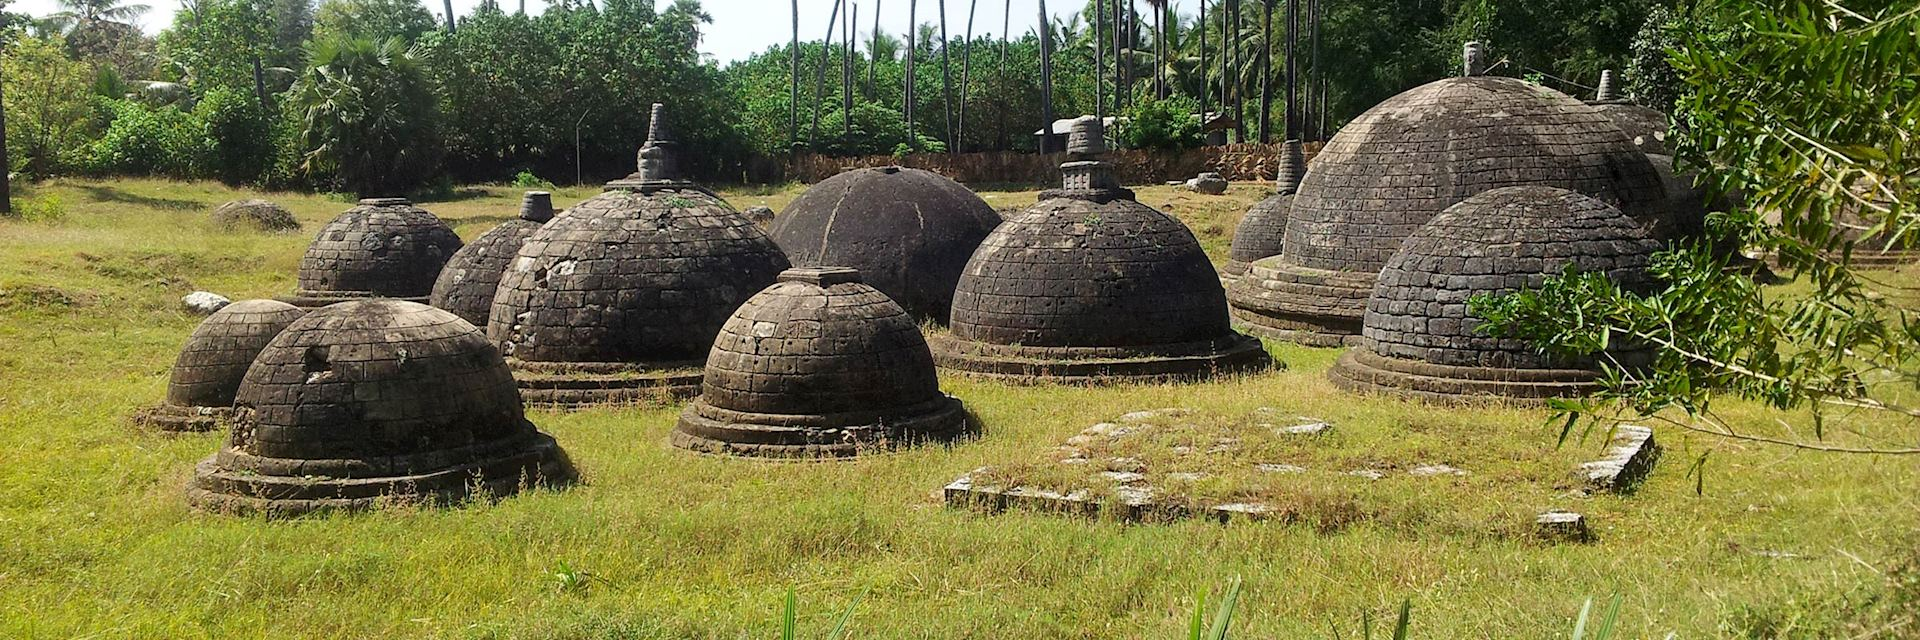 Kandarodai dagobas, Jaffna